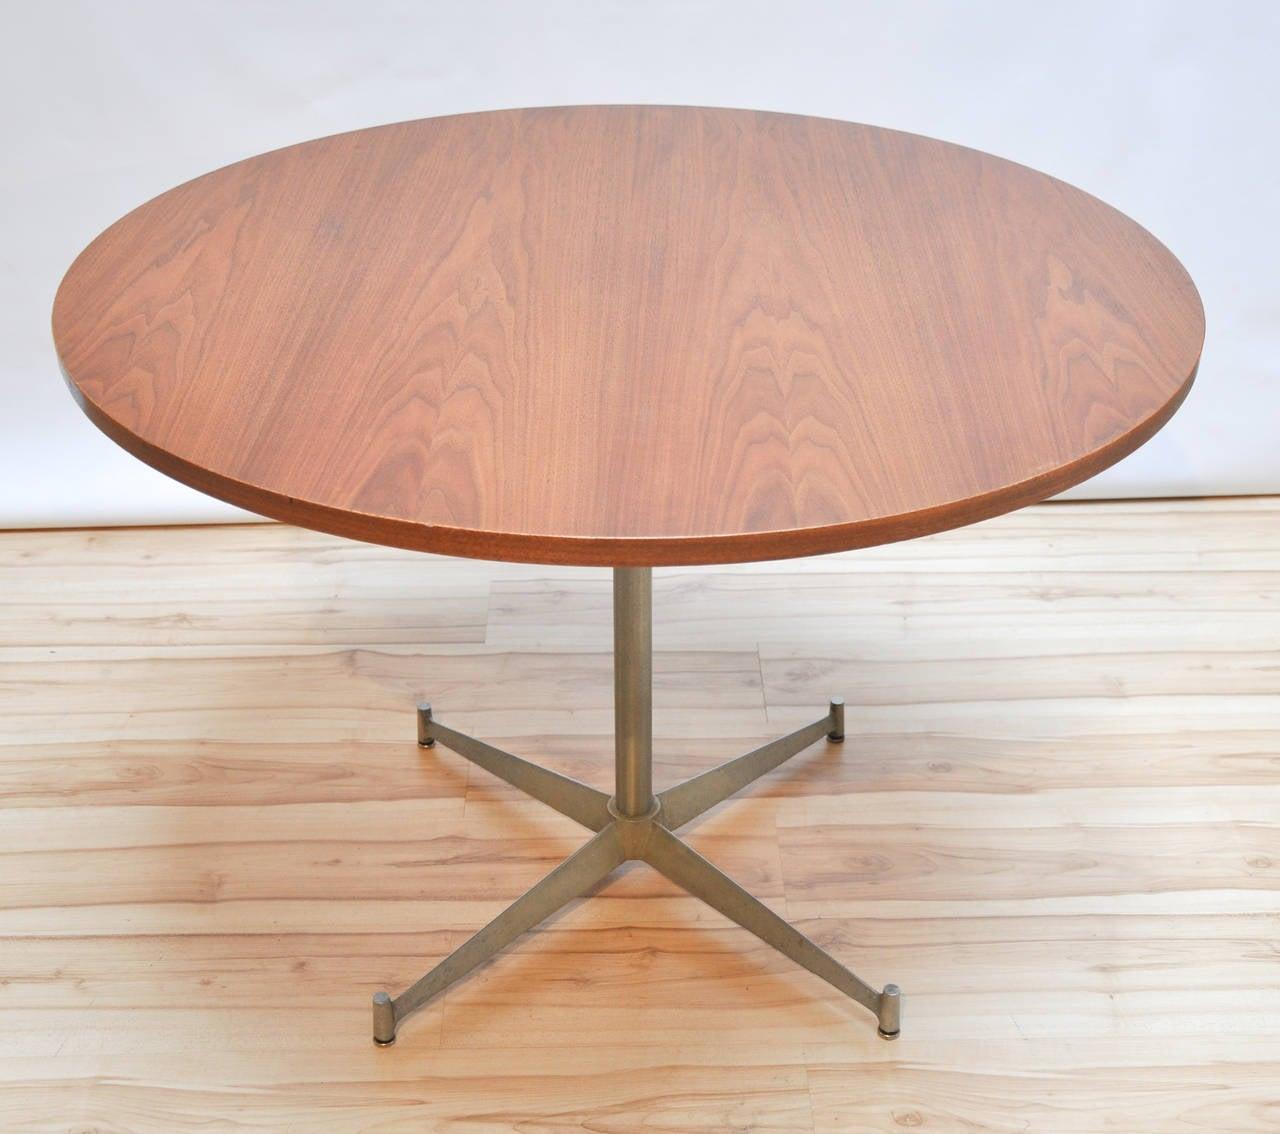 mcguire furniture company hexagonal hexagonal dining table paul mccobb second sun co archetype furniture